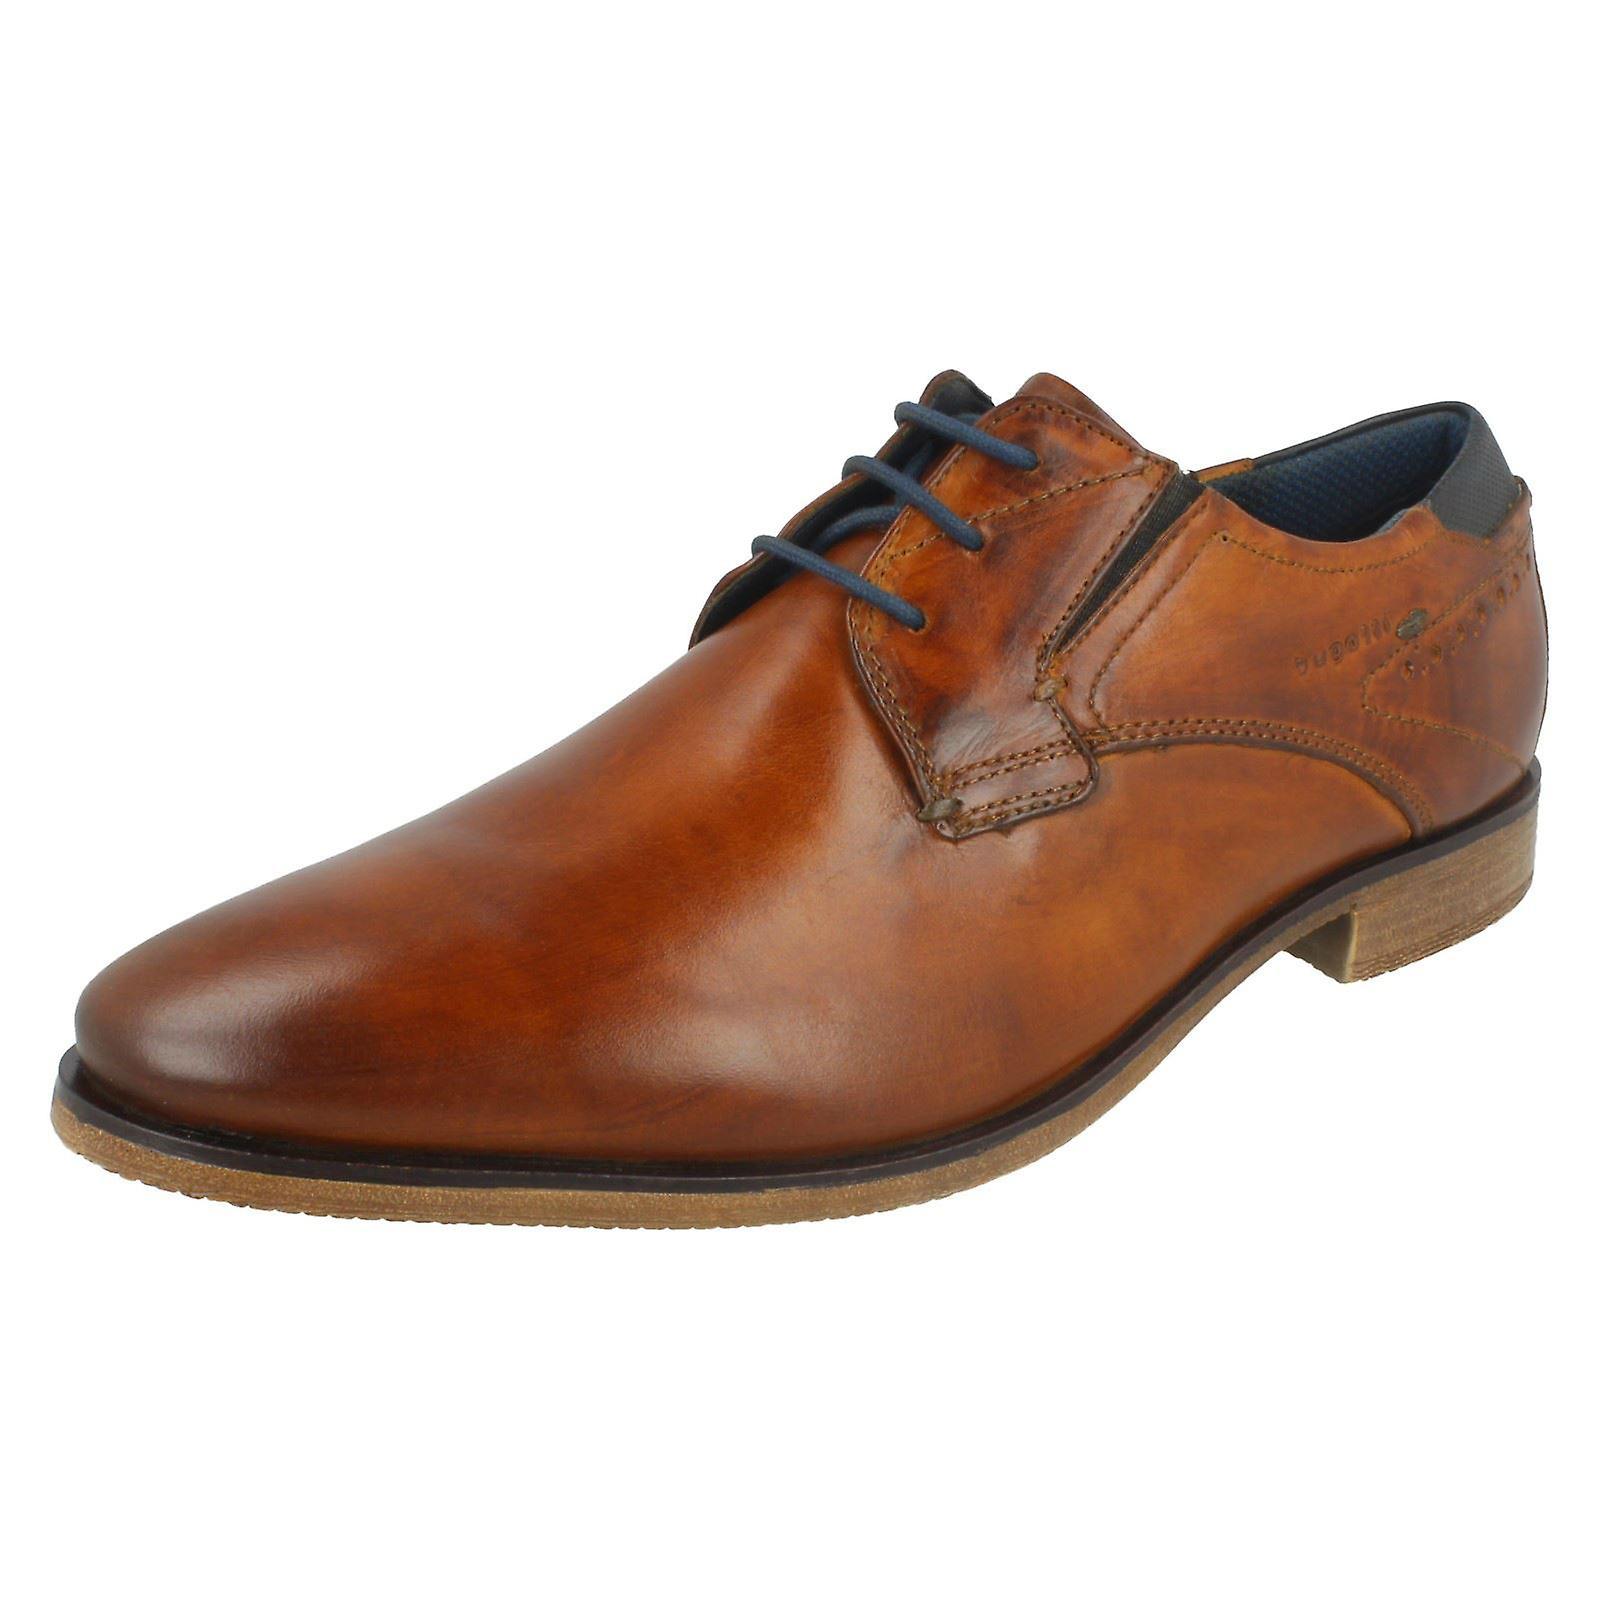 Mens Bugatti formell sko 311-25101-1100-6300